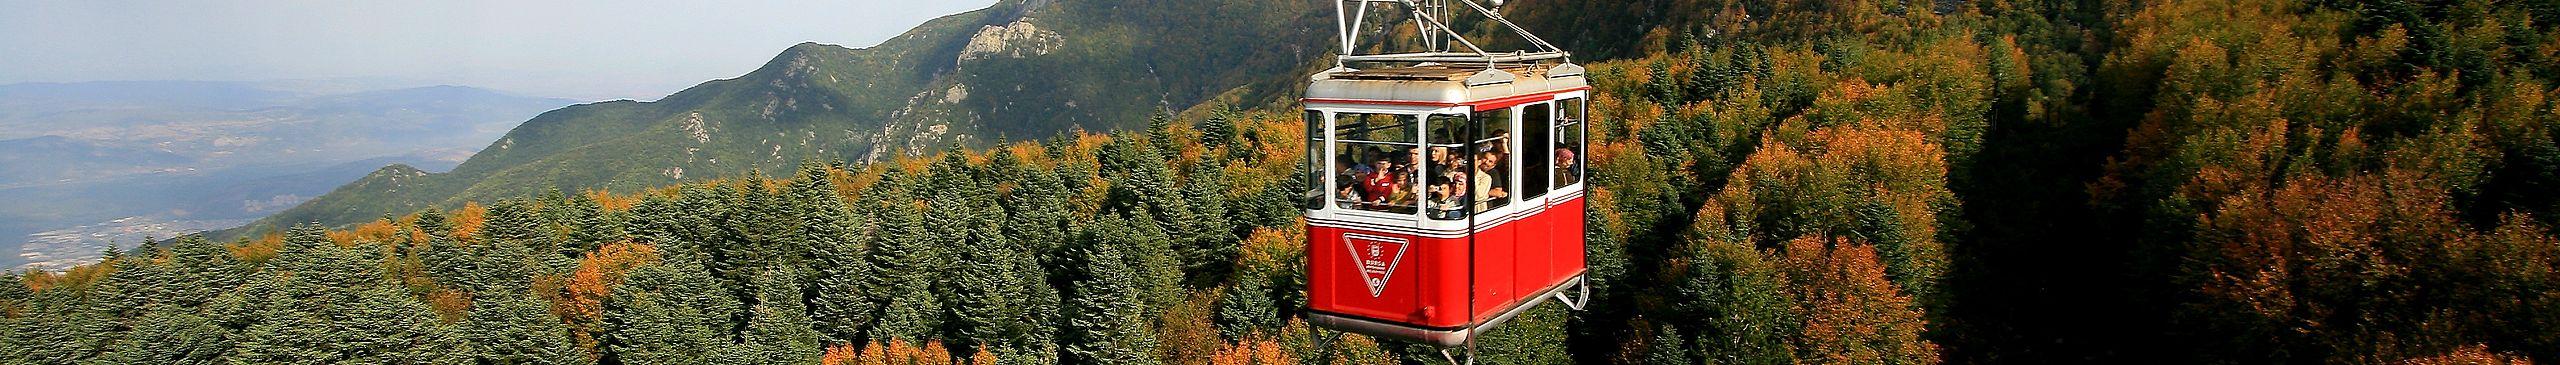 Uludağ – Travel guide at Wikivoyage